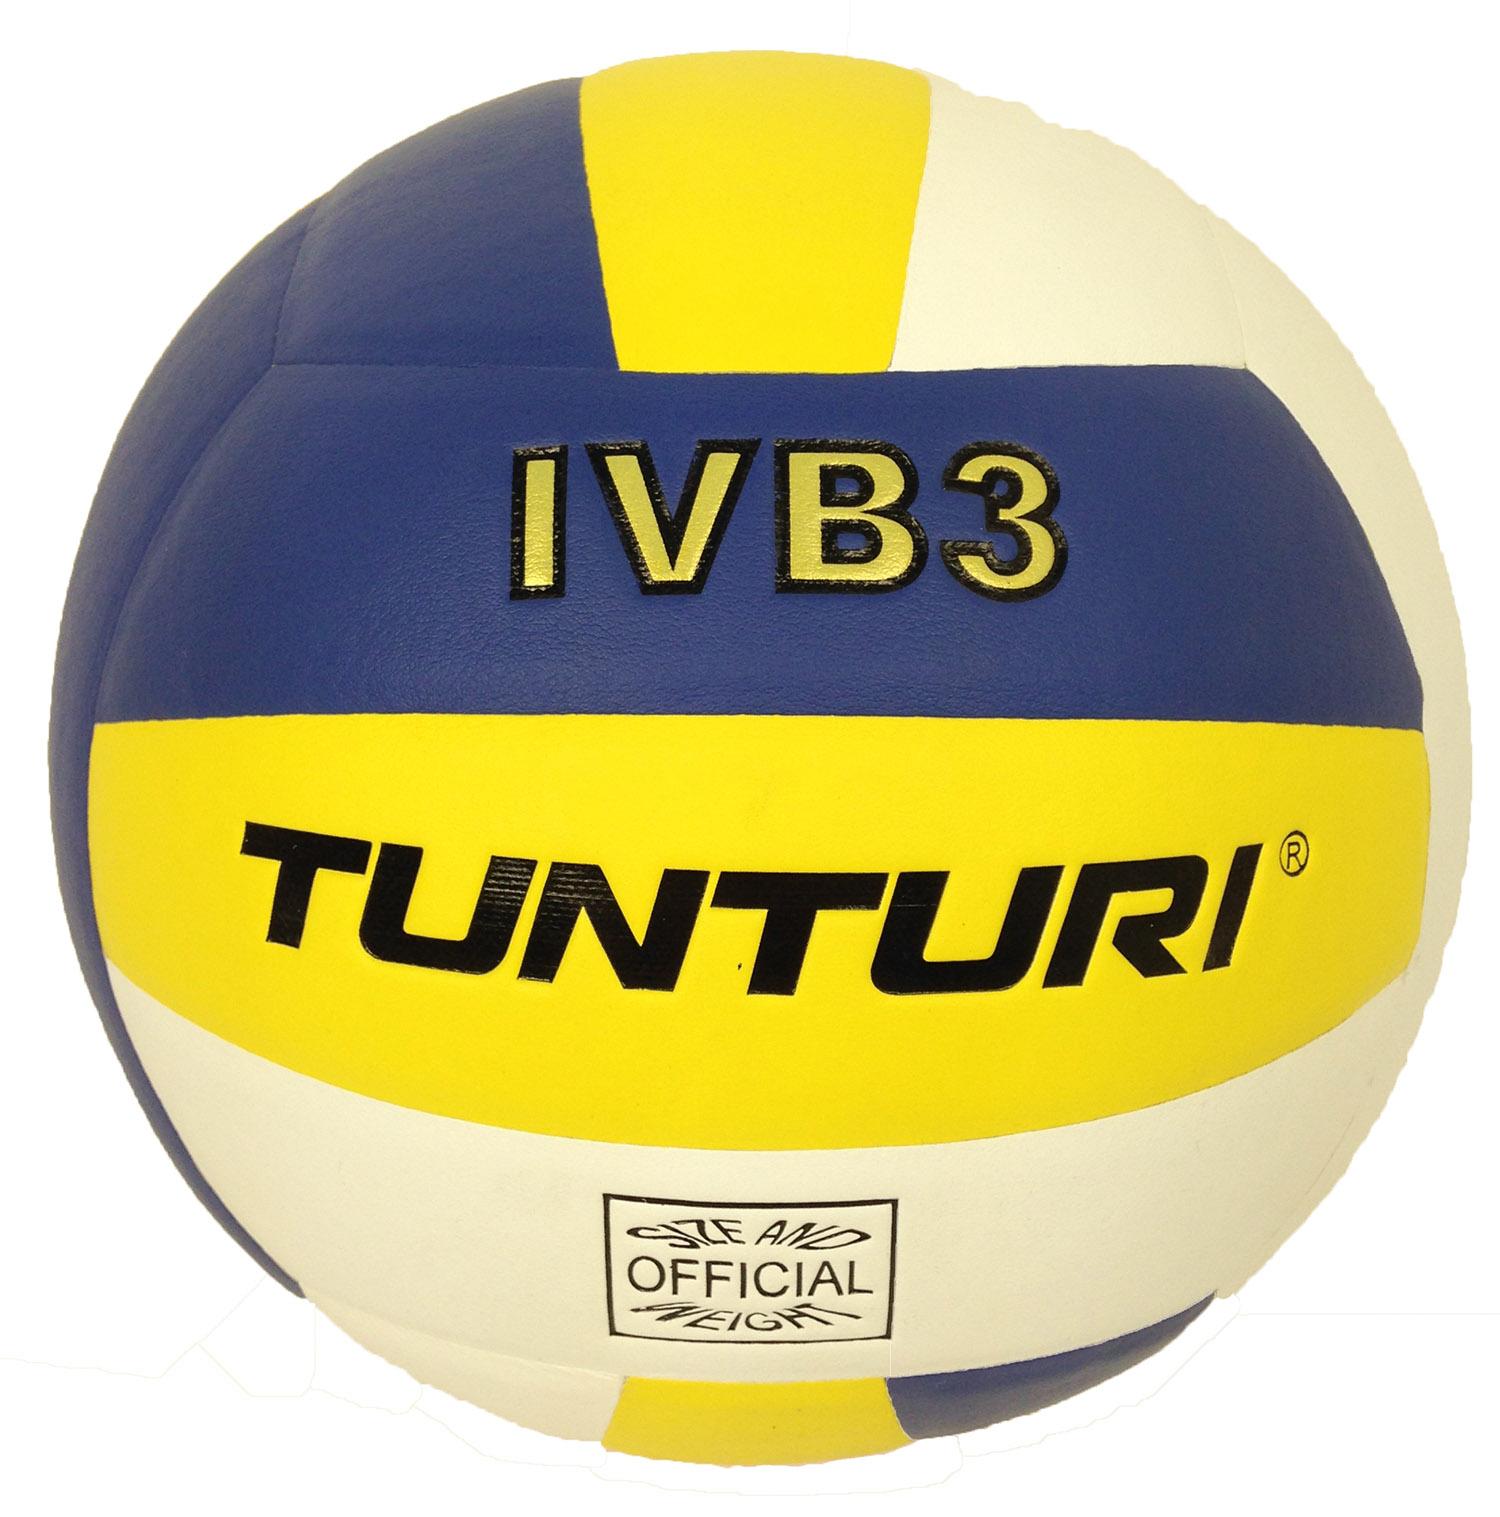 Tunturi Volleybal – Volleybal bal – IVB3 jokasport.nl